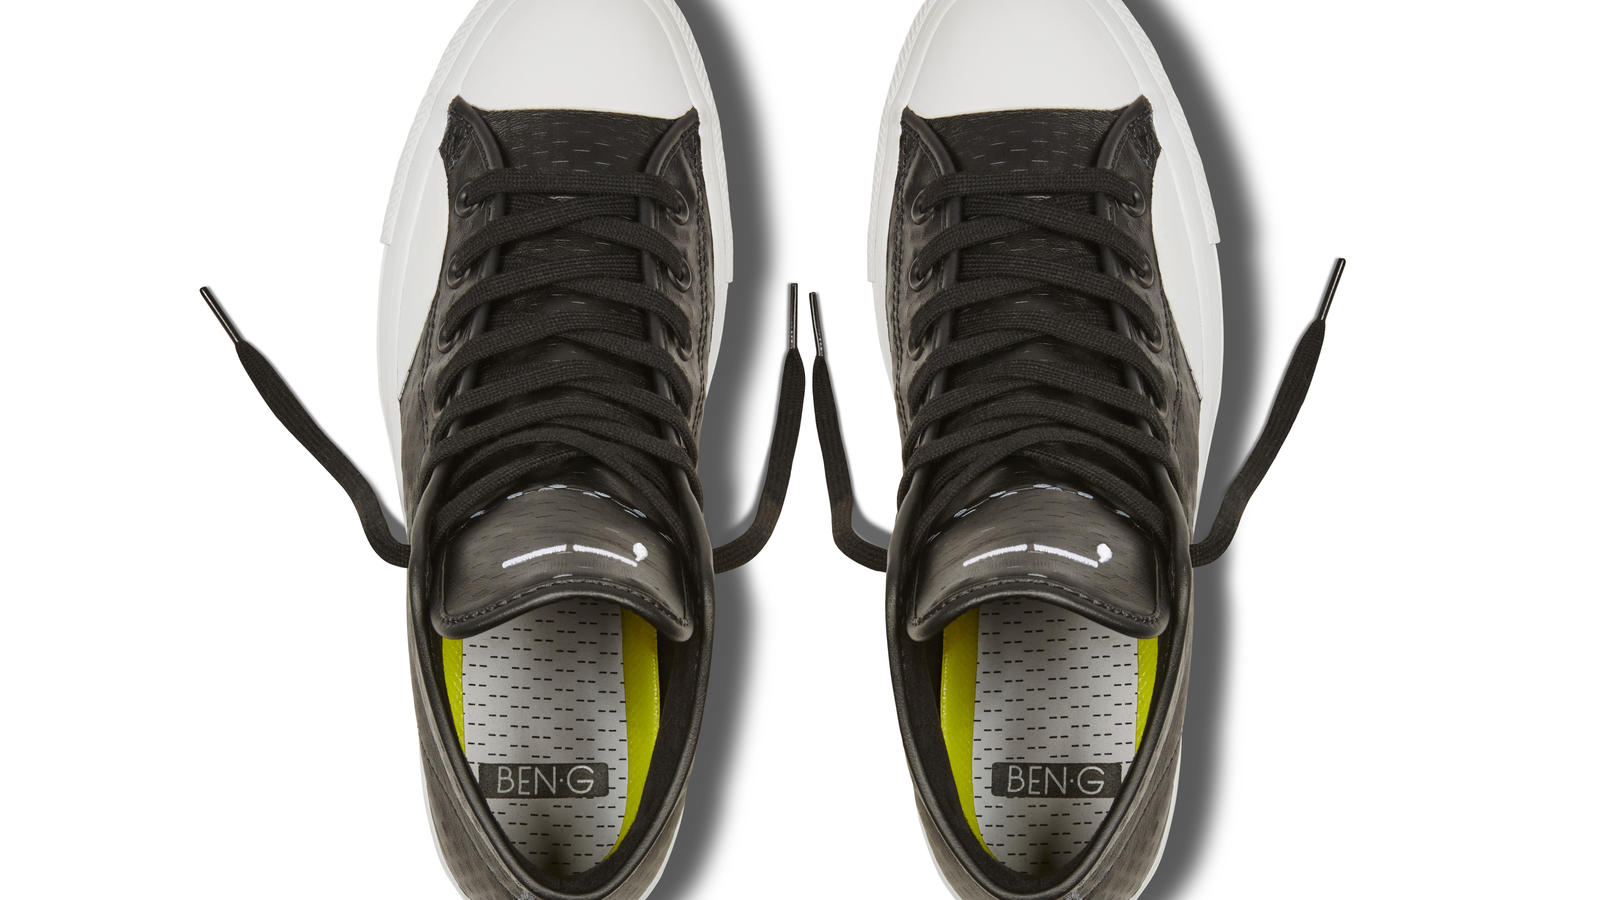 Chuck Taylor All Star Ben G Nike News